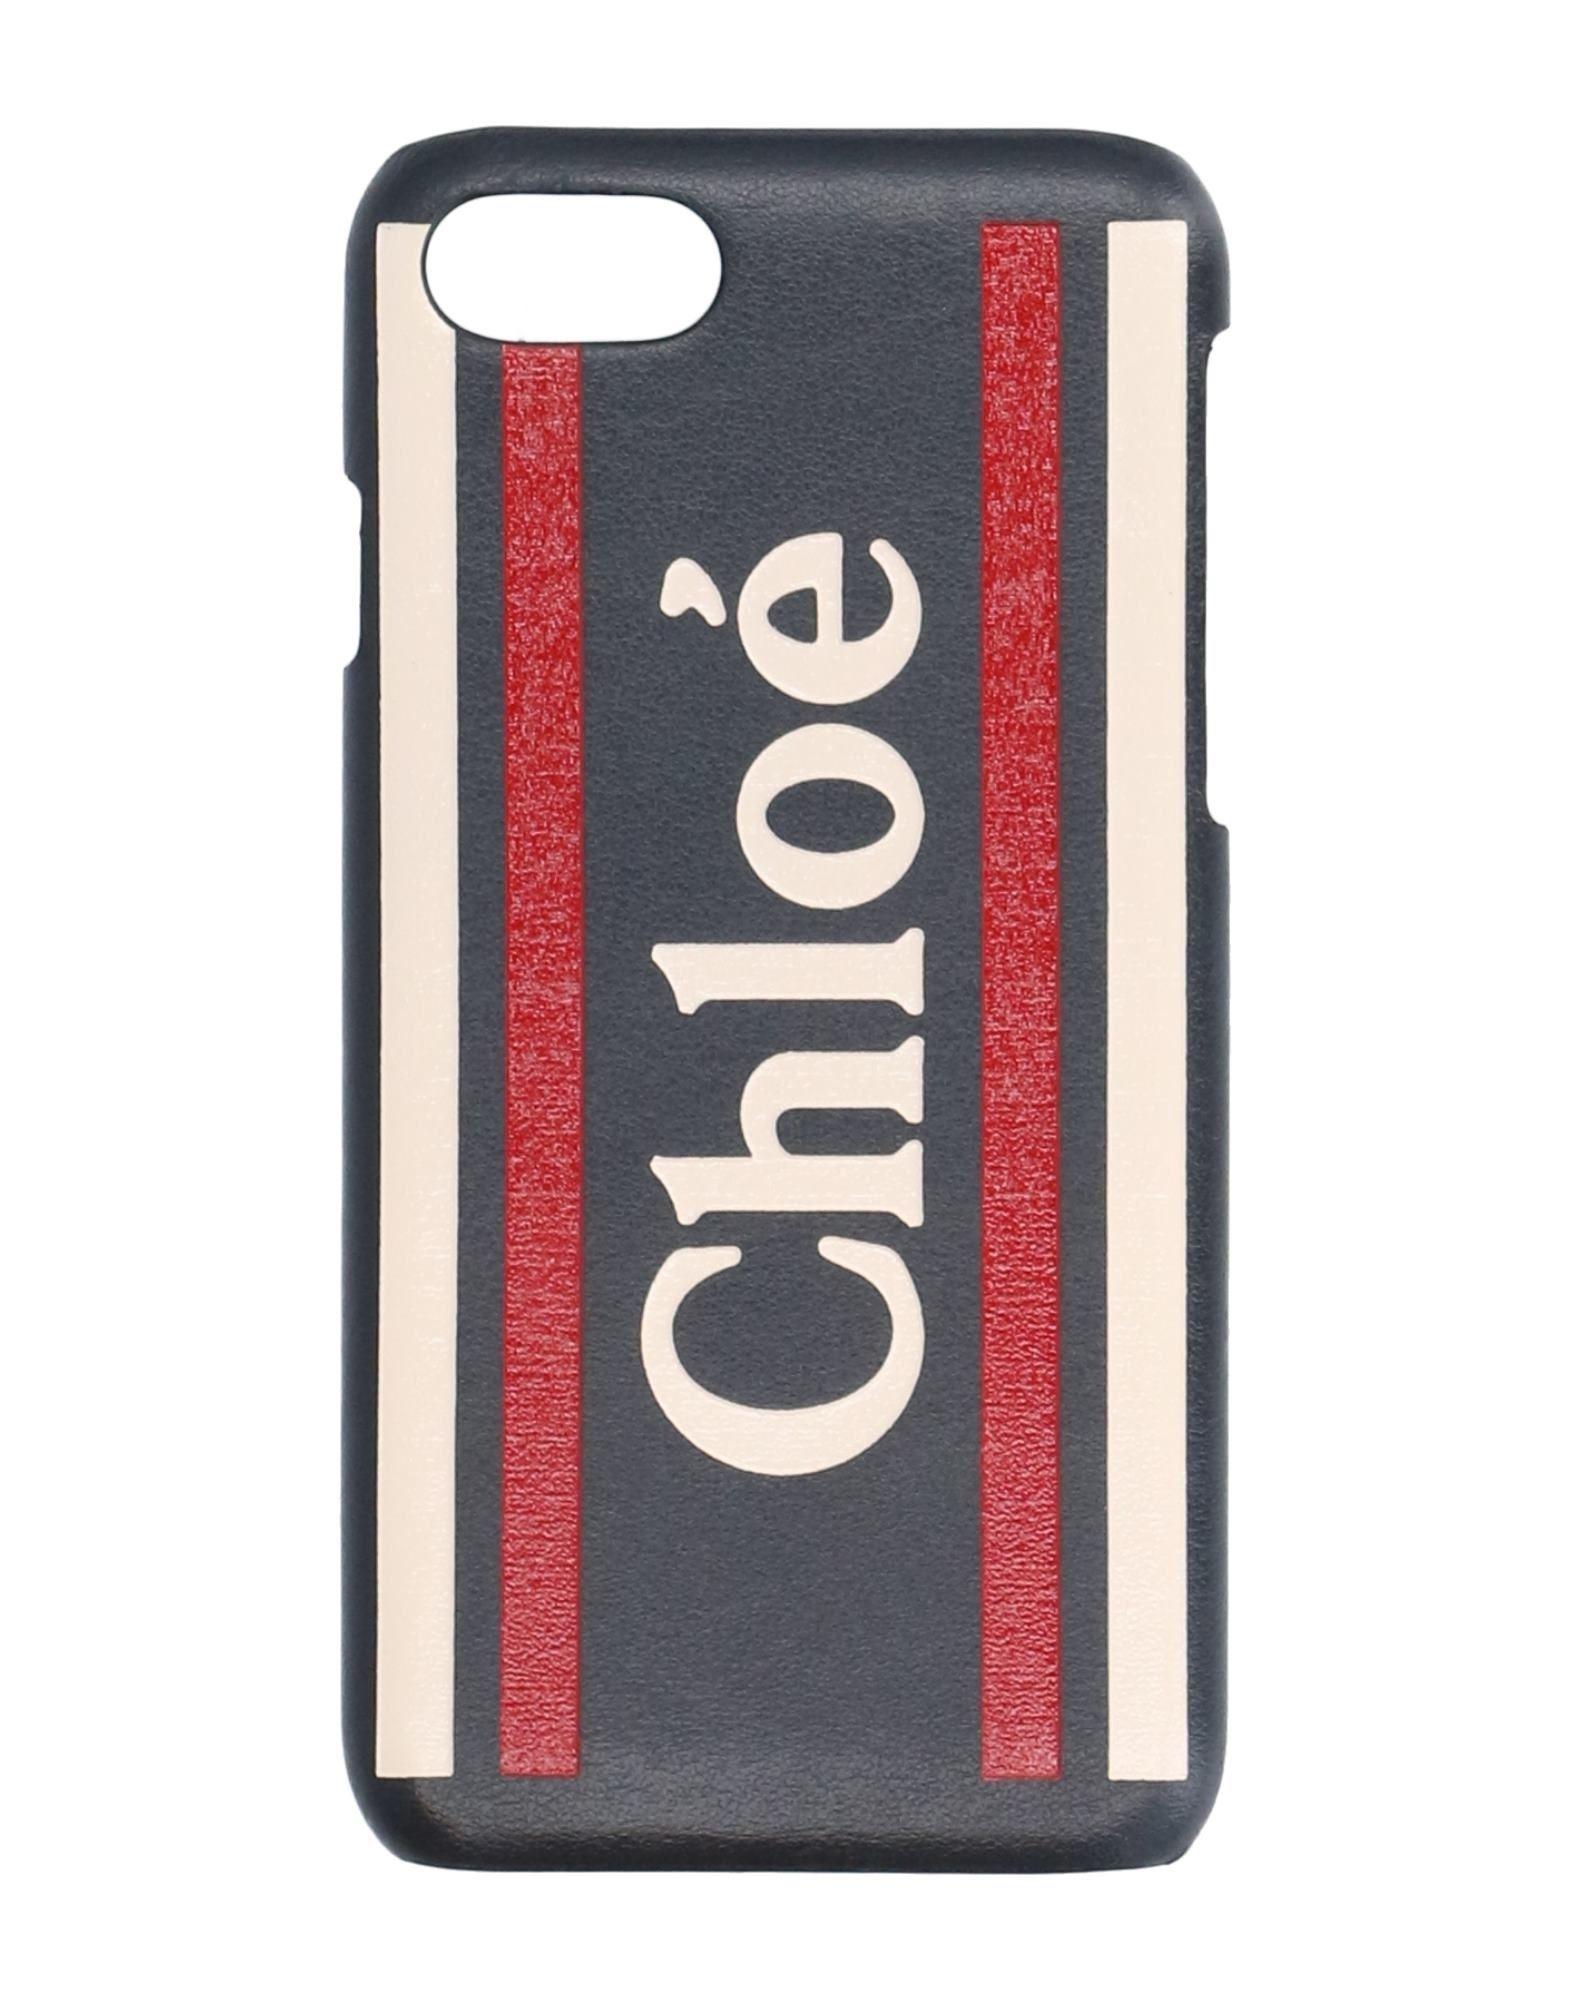 Фото - CHLOÉ Чехол printio чехол для iphone 7 объёмная печать orphan black